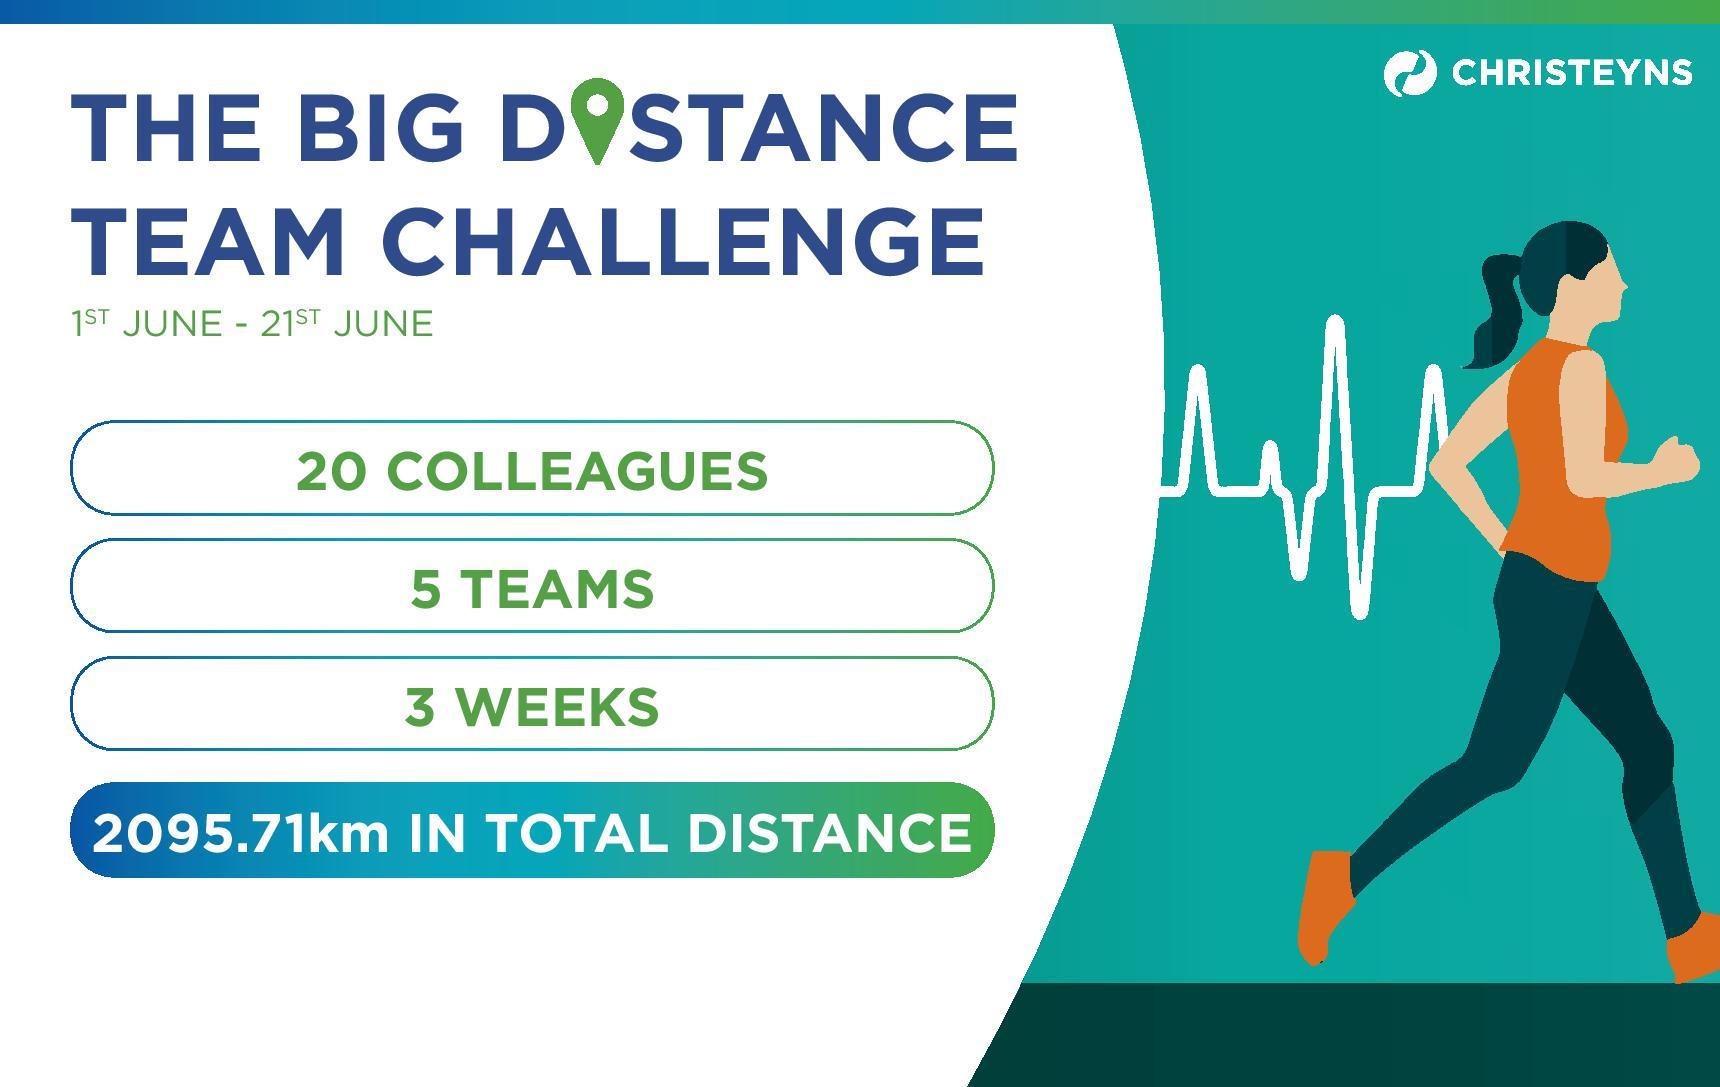 The Big Distance Team Challenge